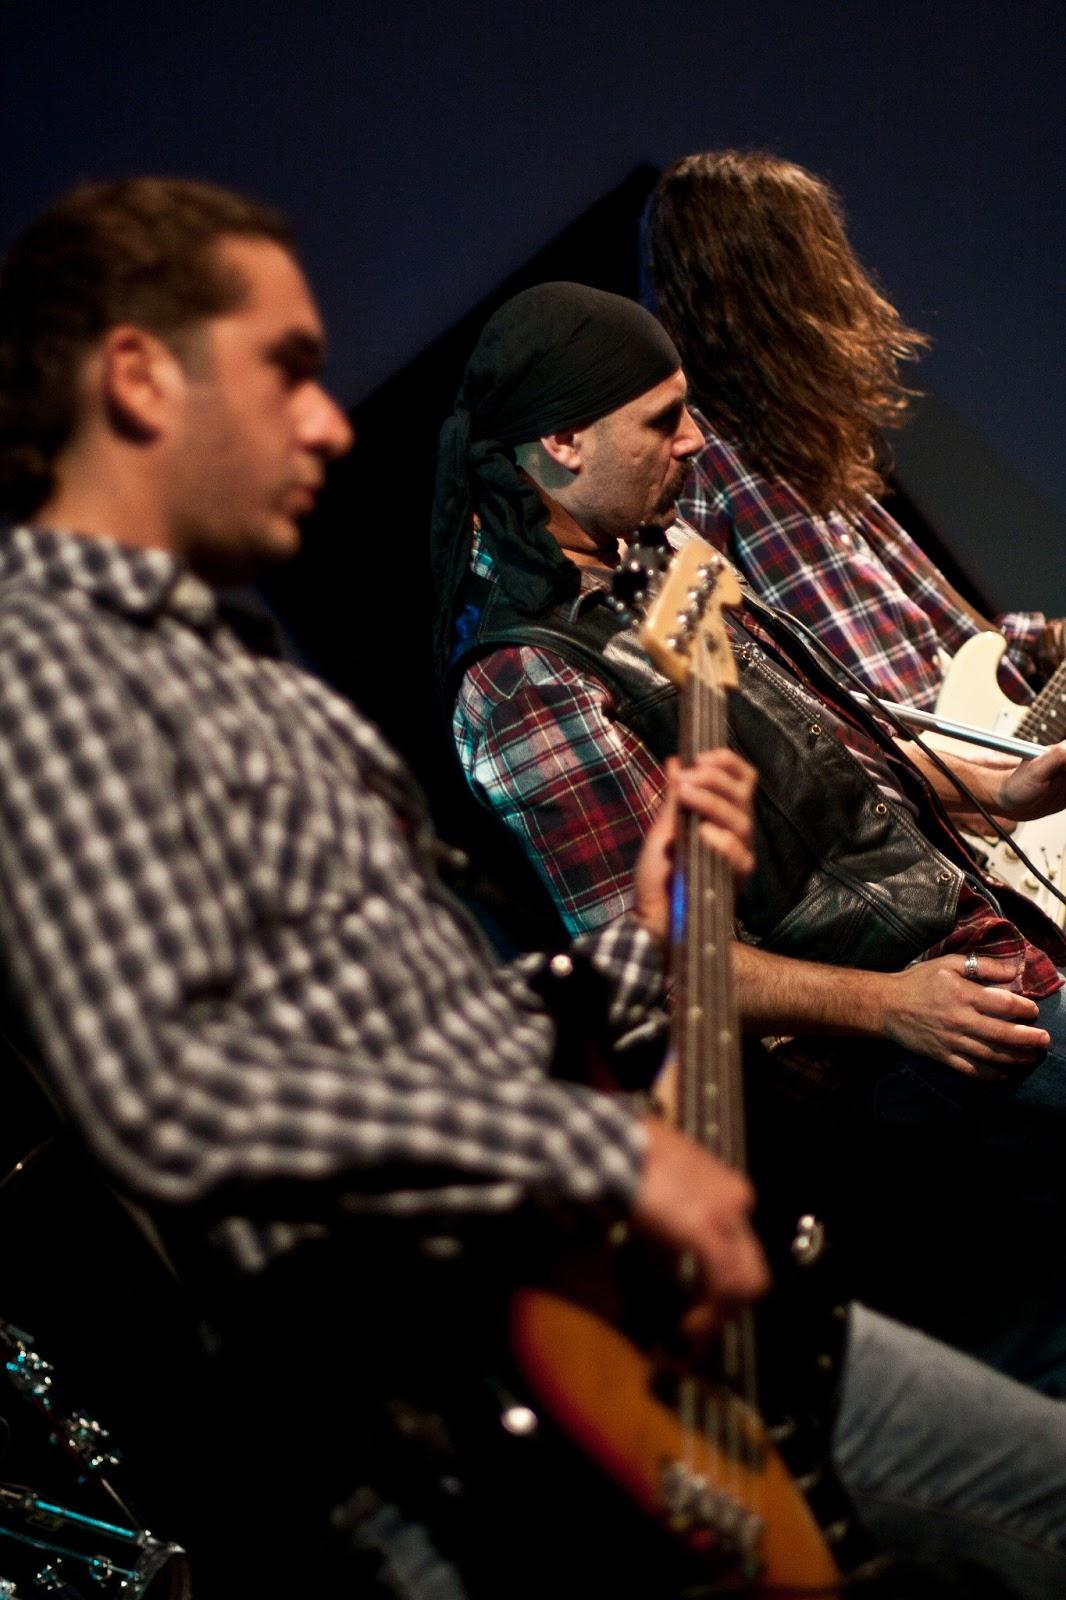 Cremonapalloza Rock Fest 2012 - By JJSante